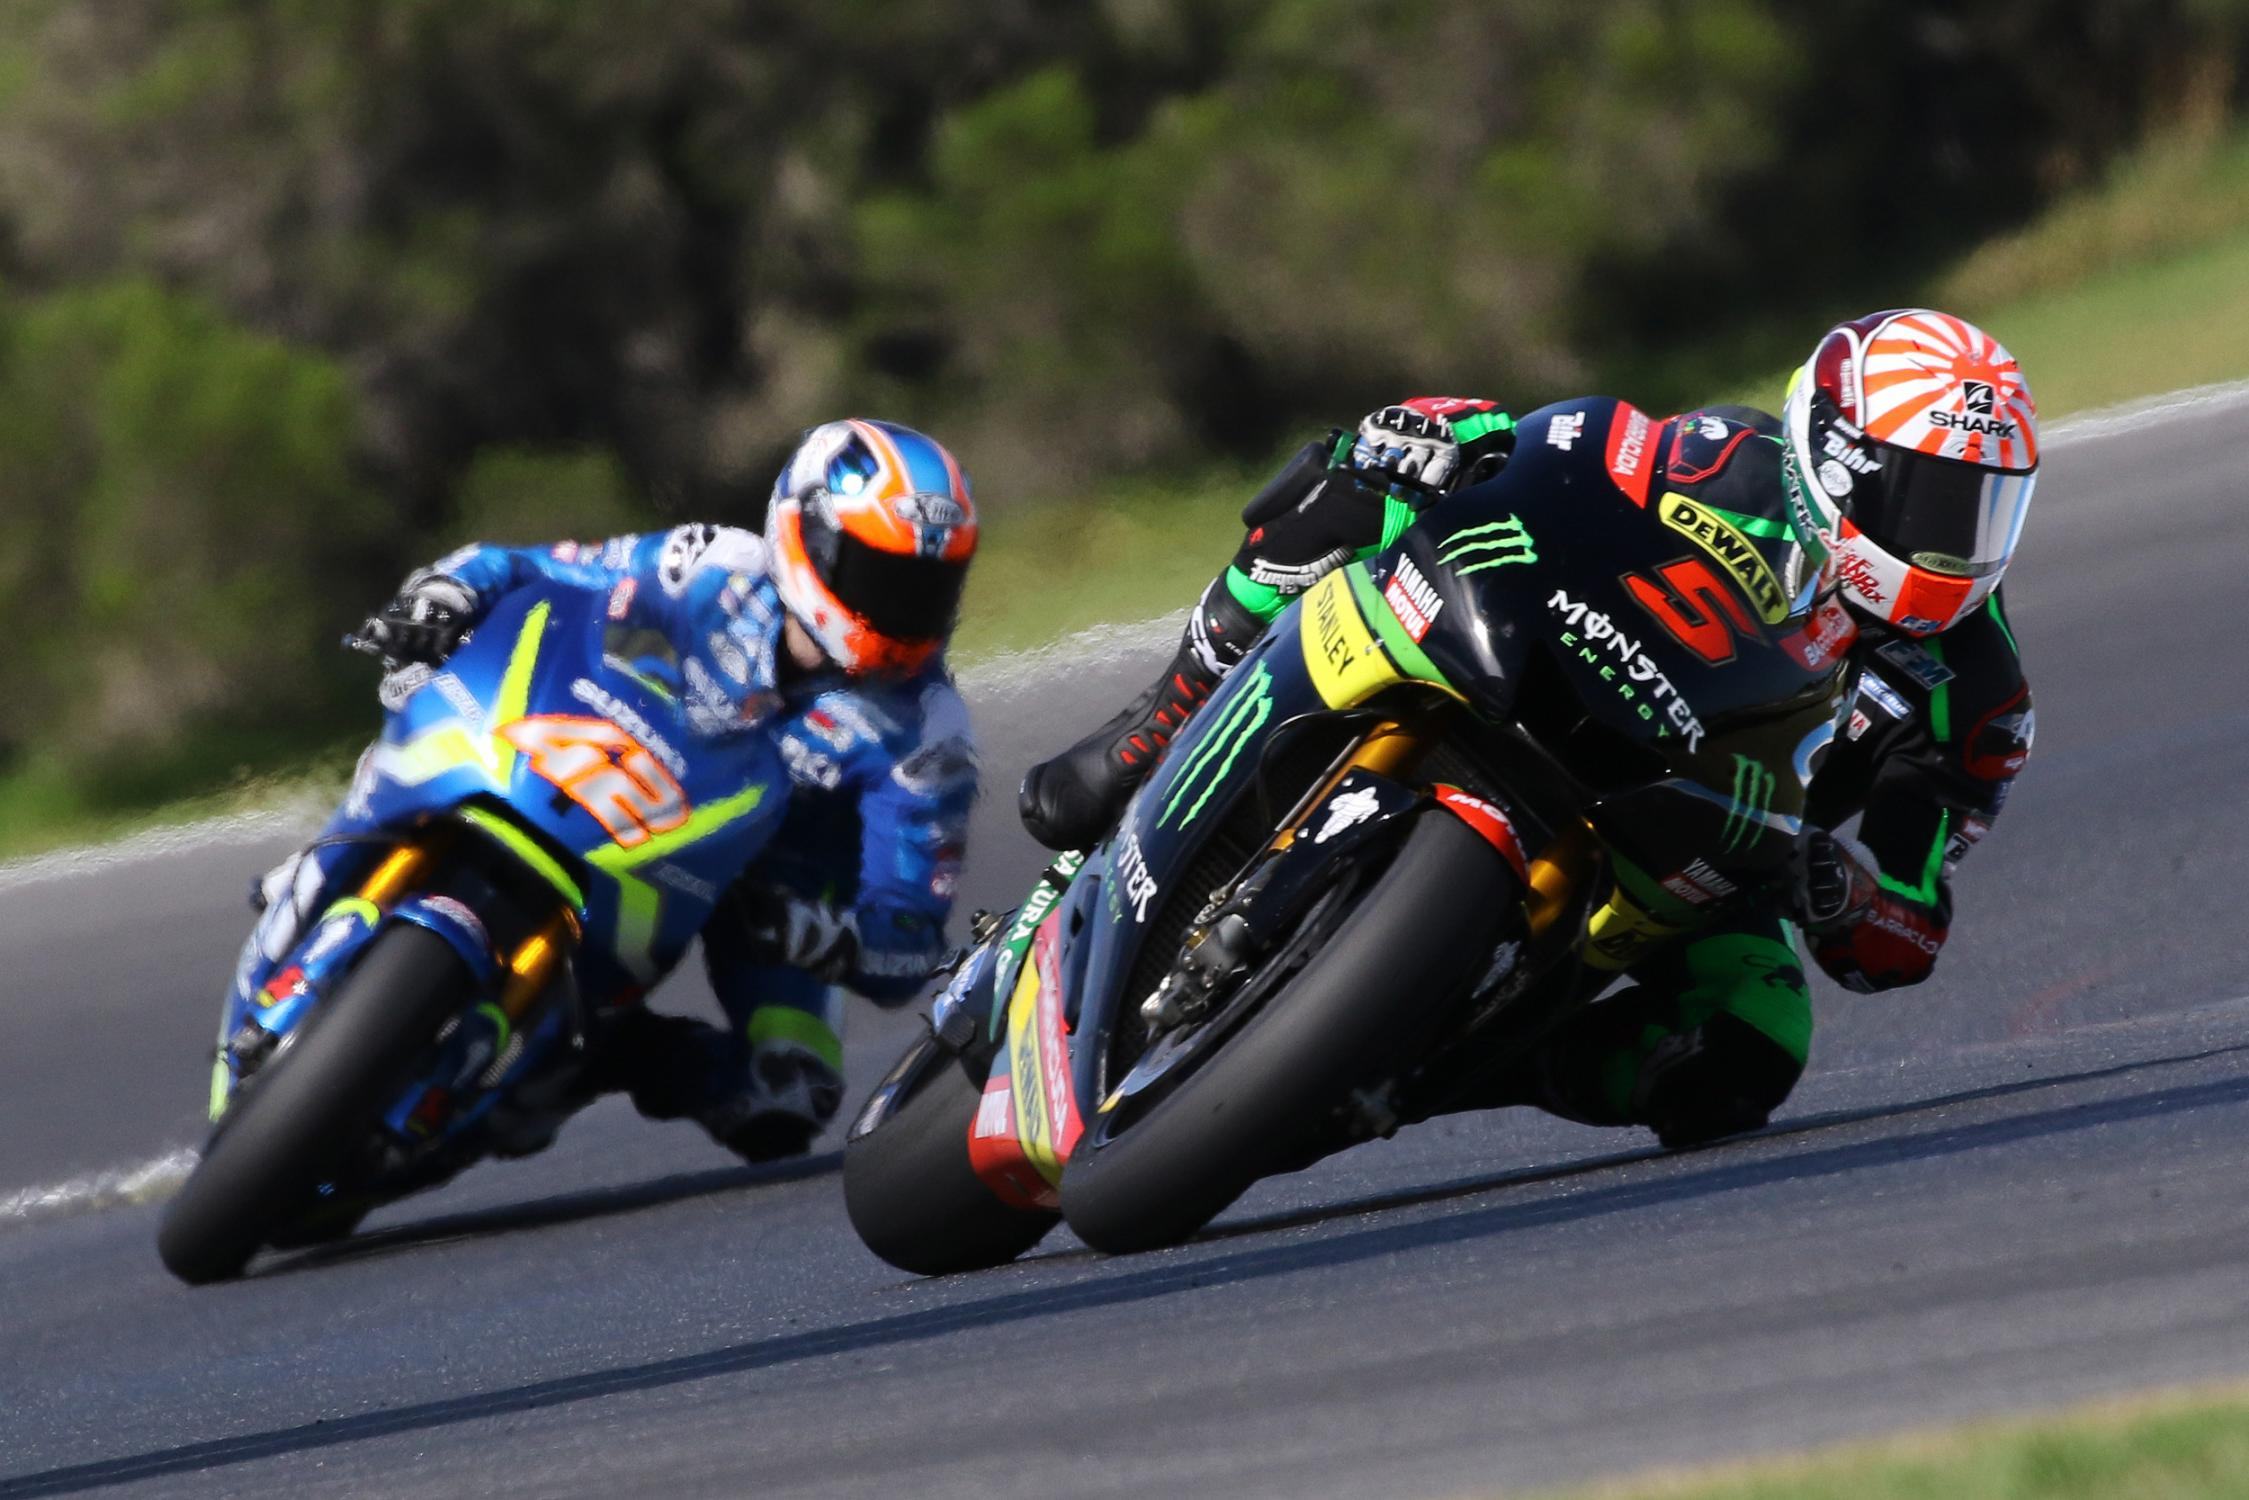 [MotoGP] Test Phillip Island 05-johann-zarco-fra-42-alex-rins-esp1p6a0717.gallery_full_top_fullscreen